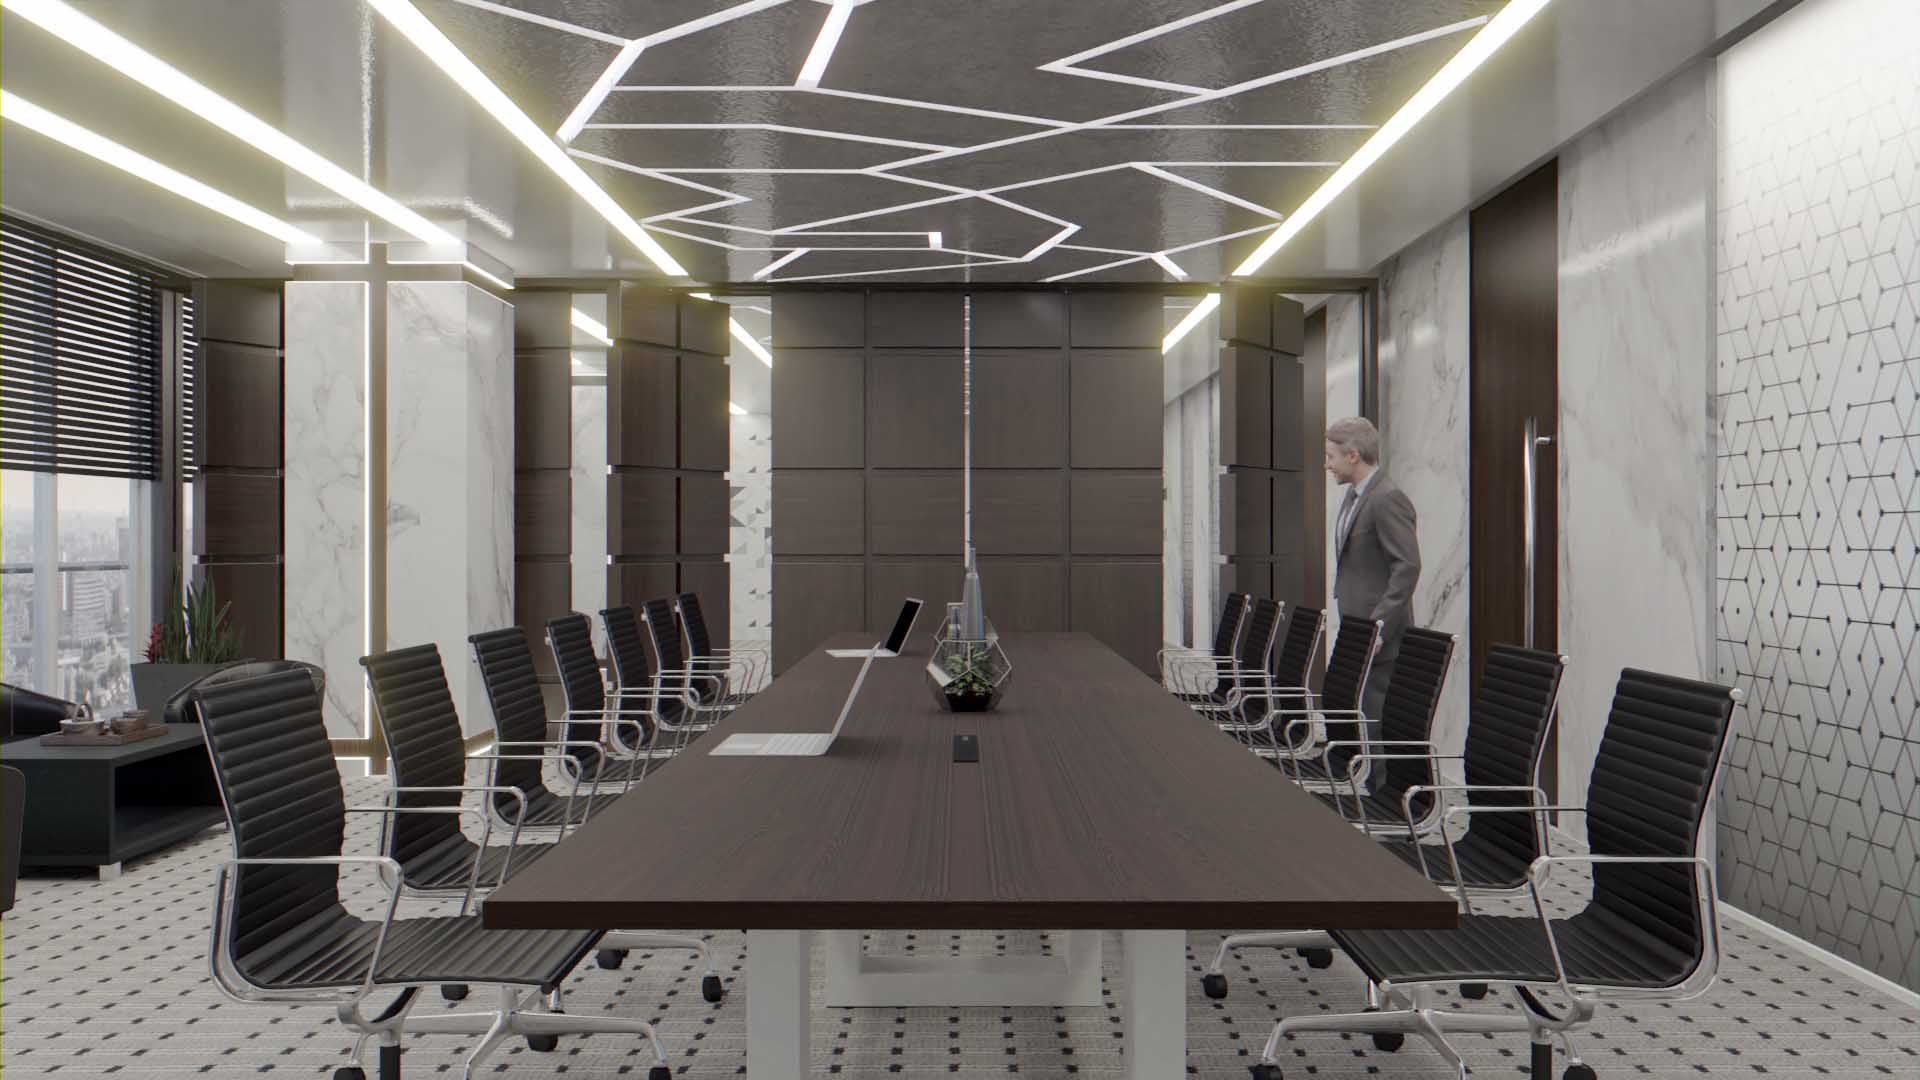 Boardroom_Ramco_Serenity interiors.3